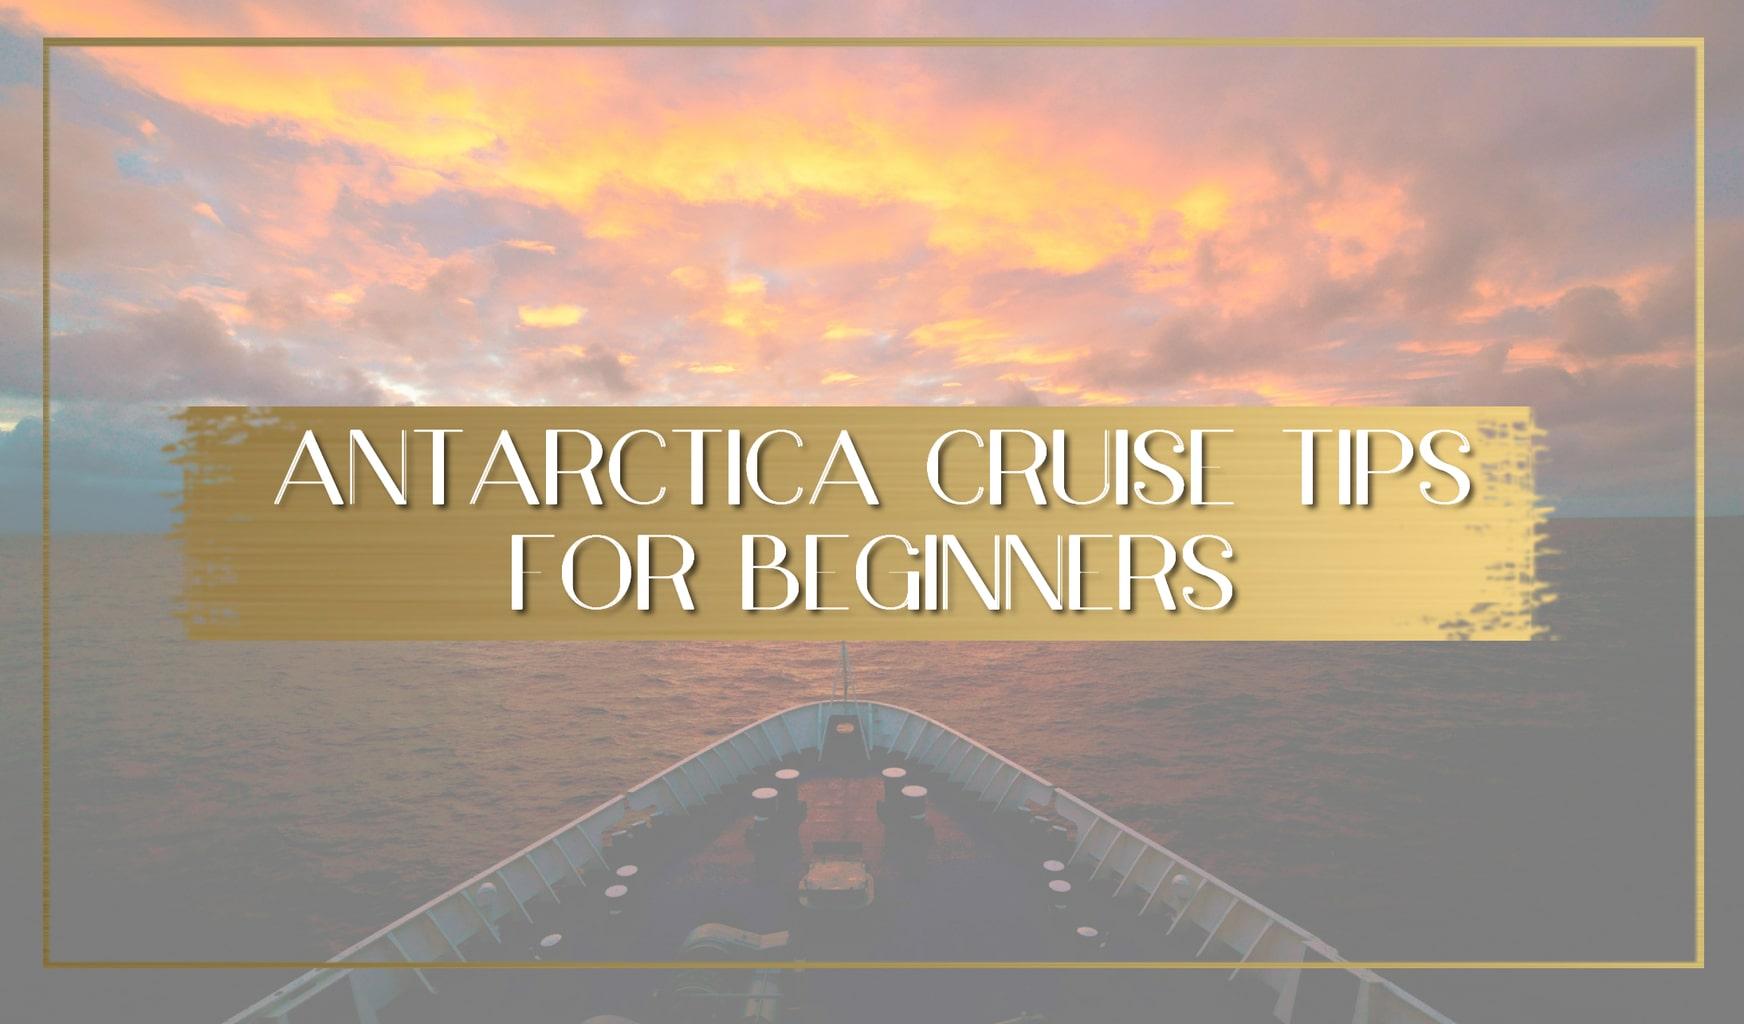 Antarctica Cruise Tips for beginners main